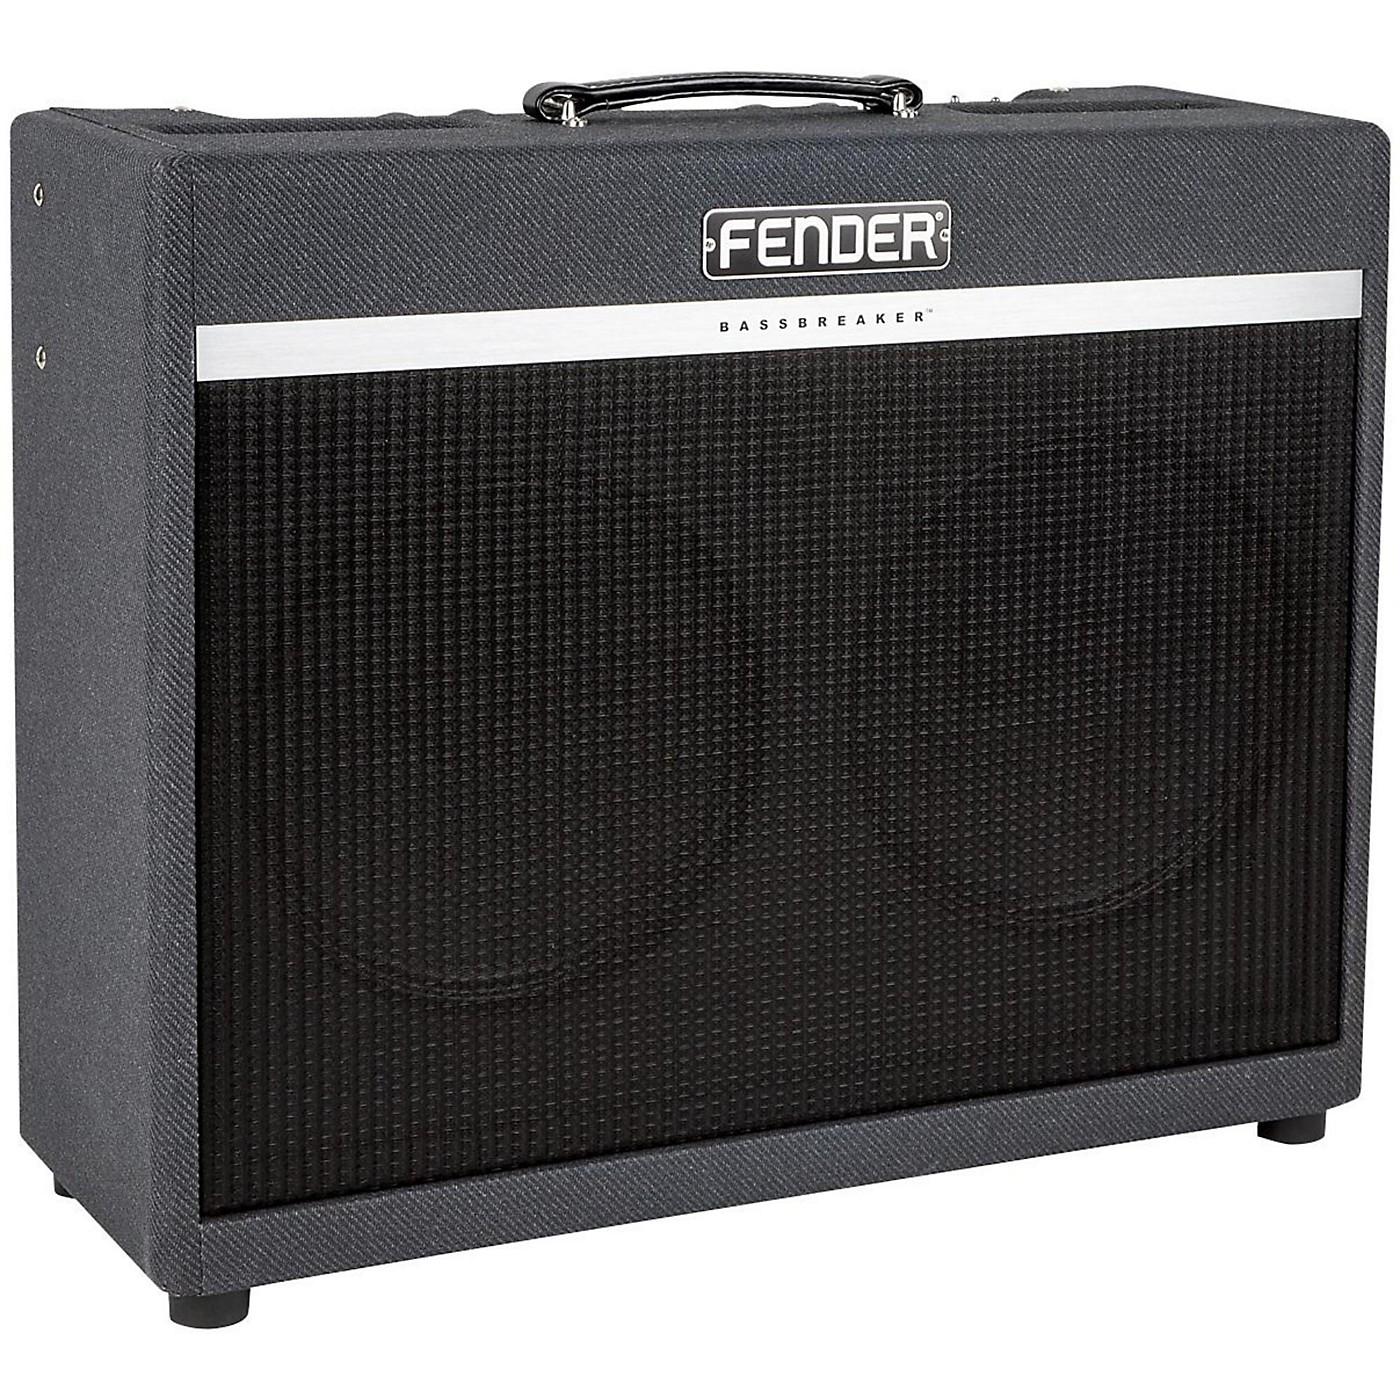 Fender Bassbreaker 18/30W 2x12 Tube Guitar Combo Amp thumbnail